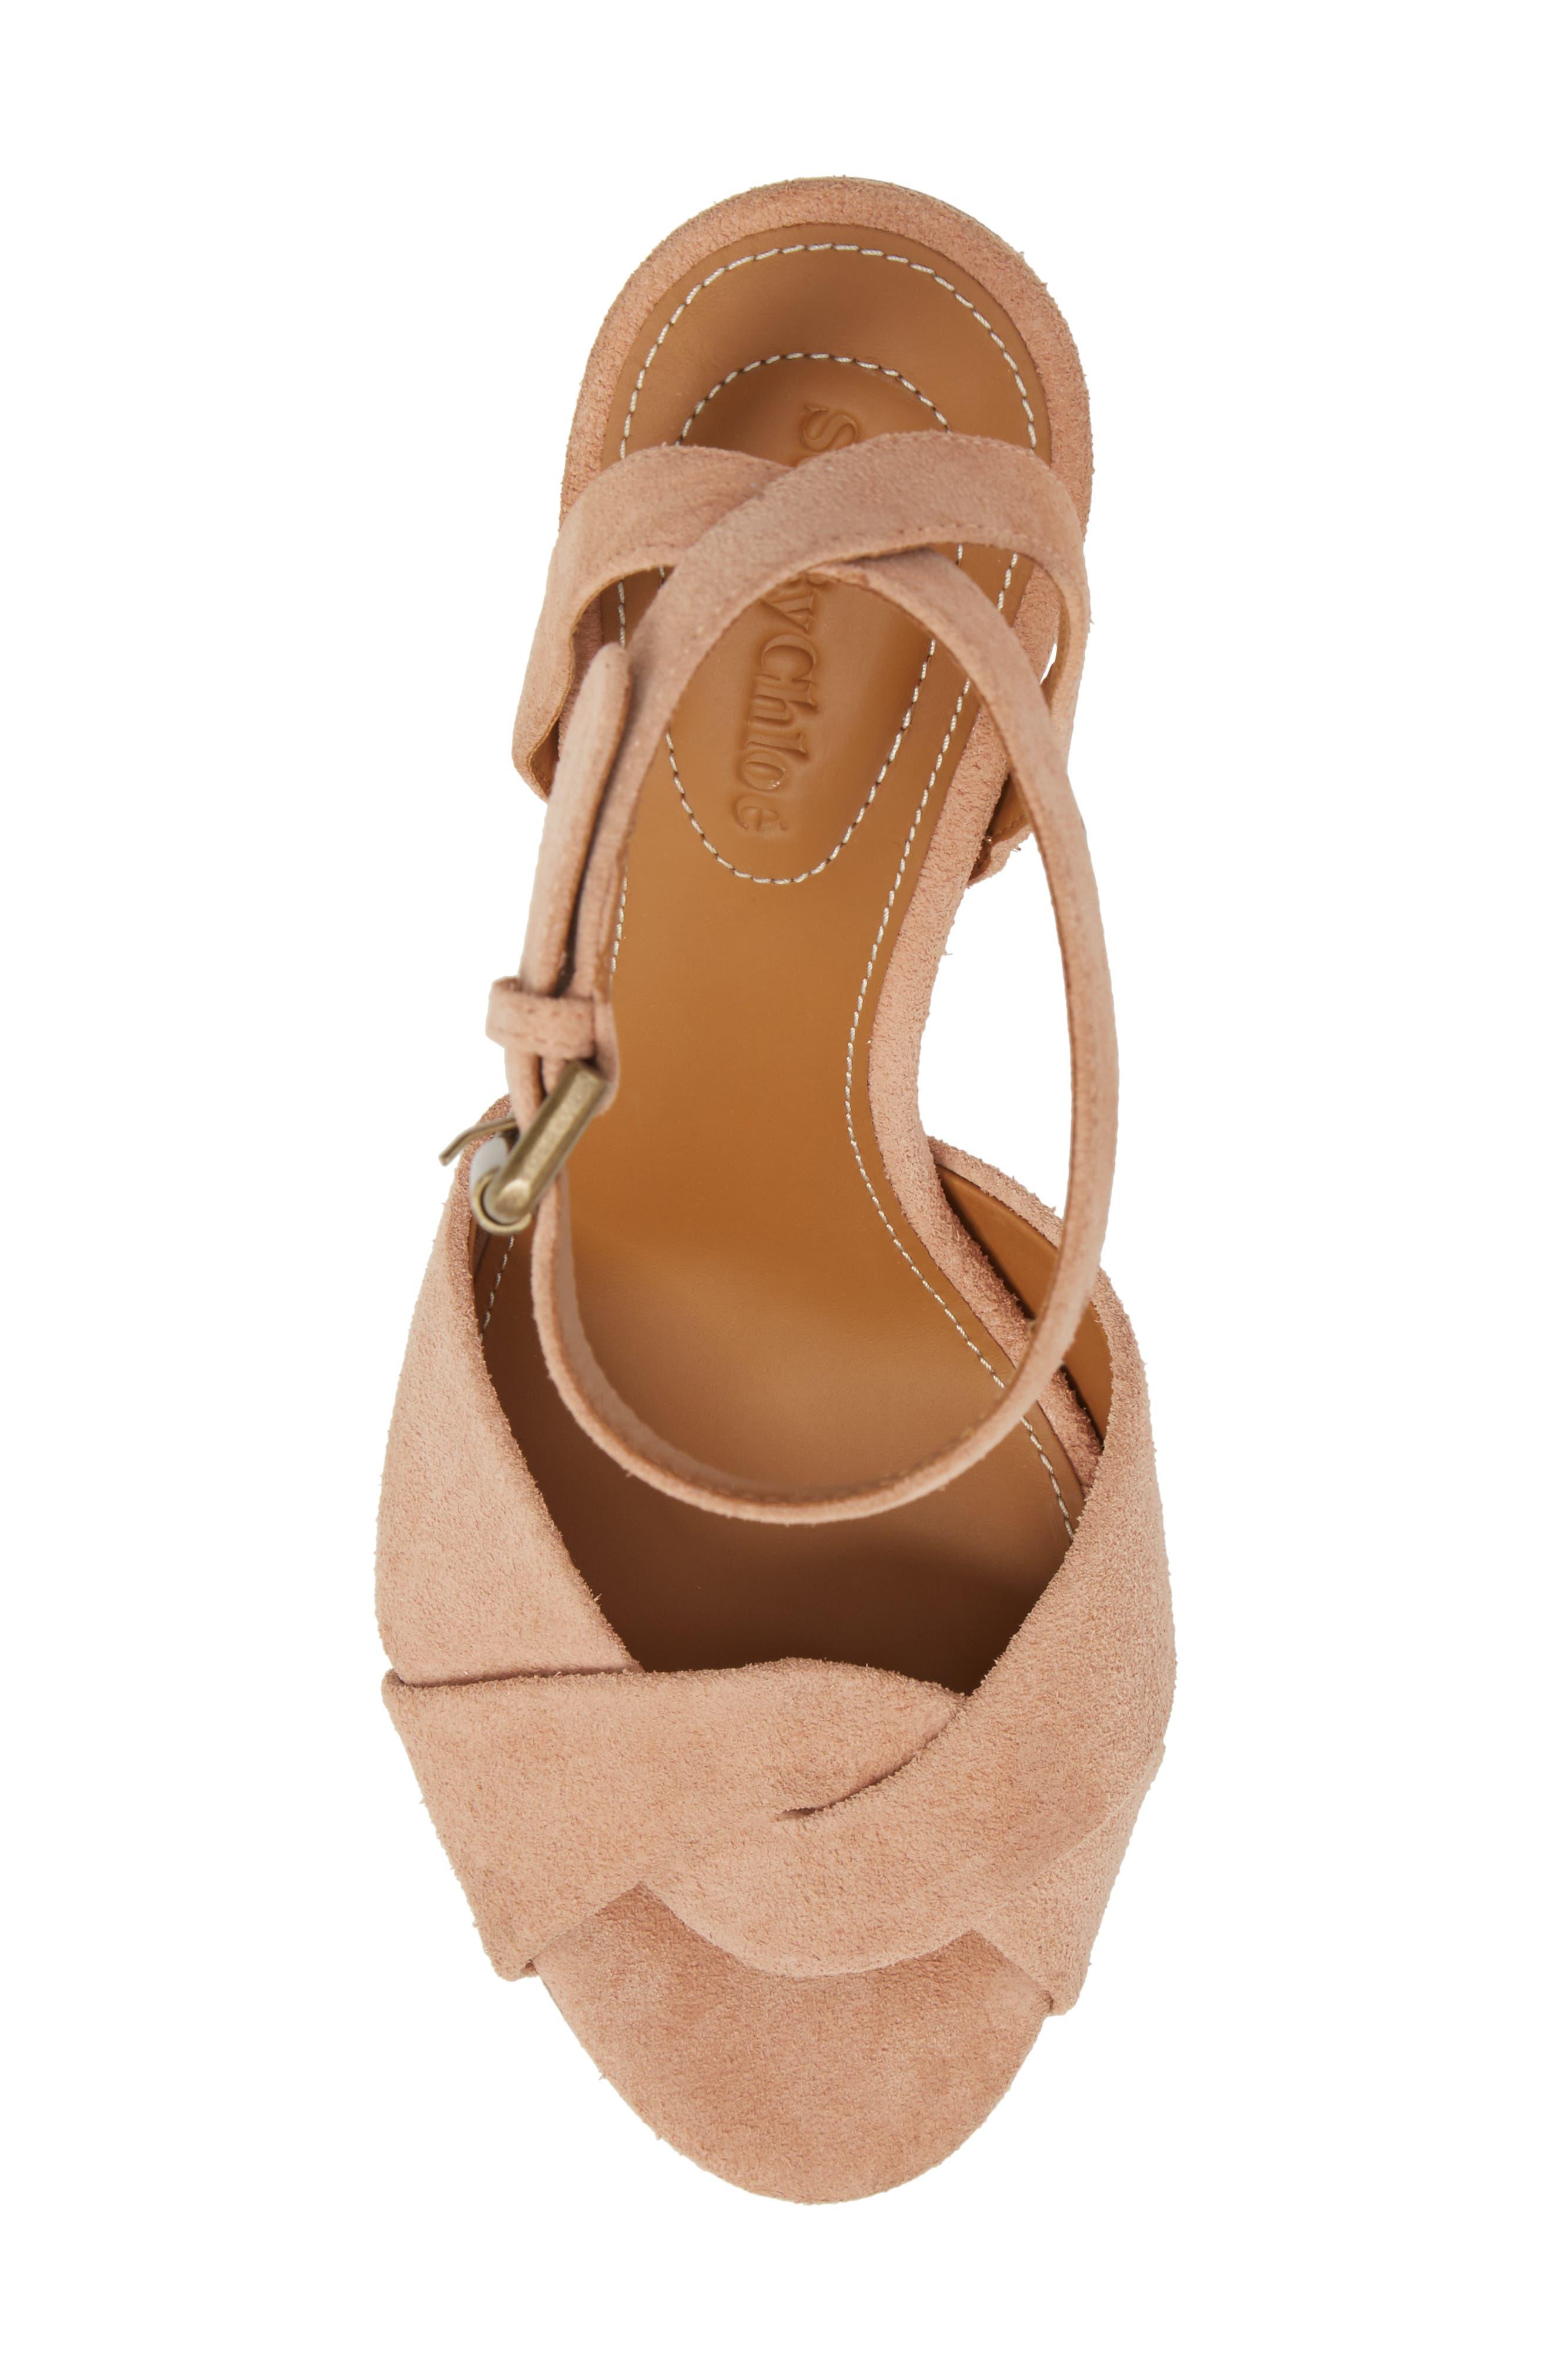 Isida Block Heel Sandal,                             Alternate thumbnail 5, color,                             210